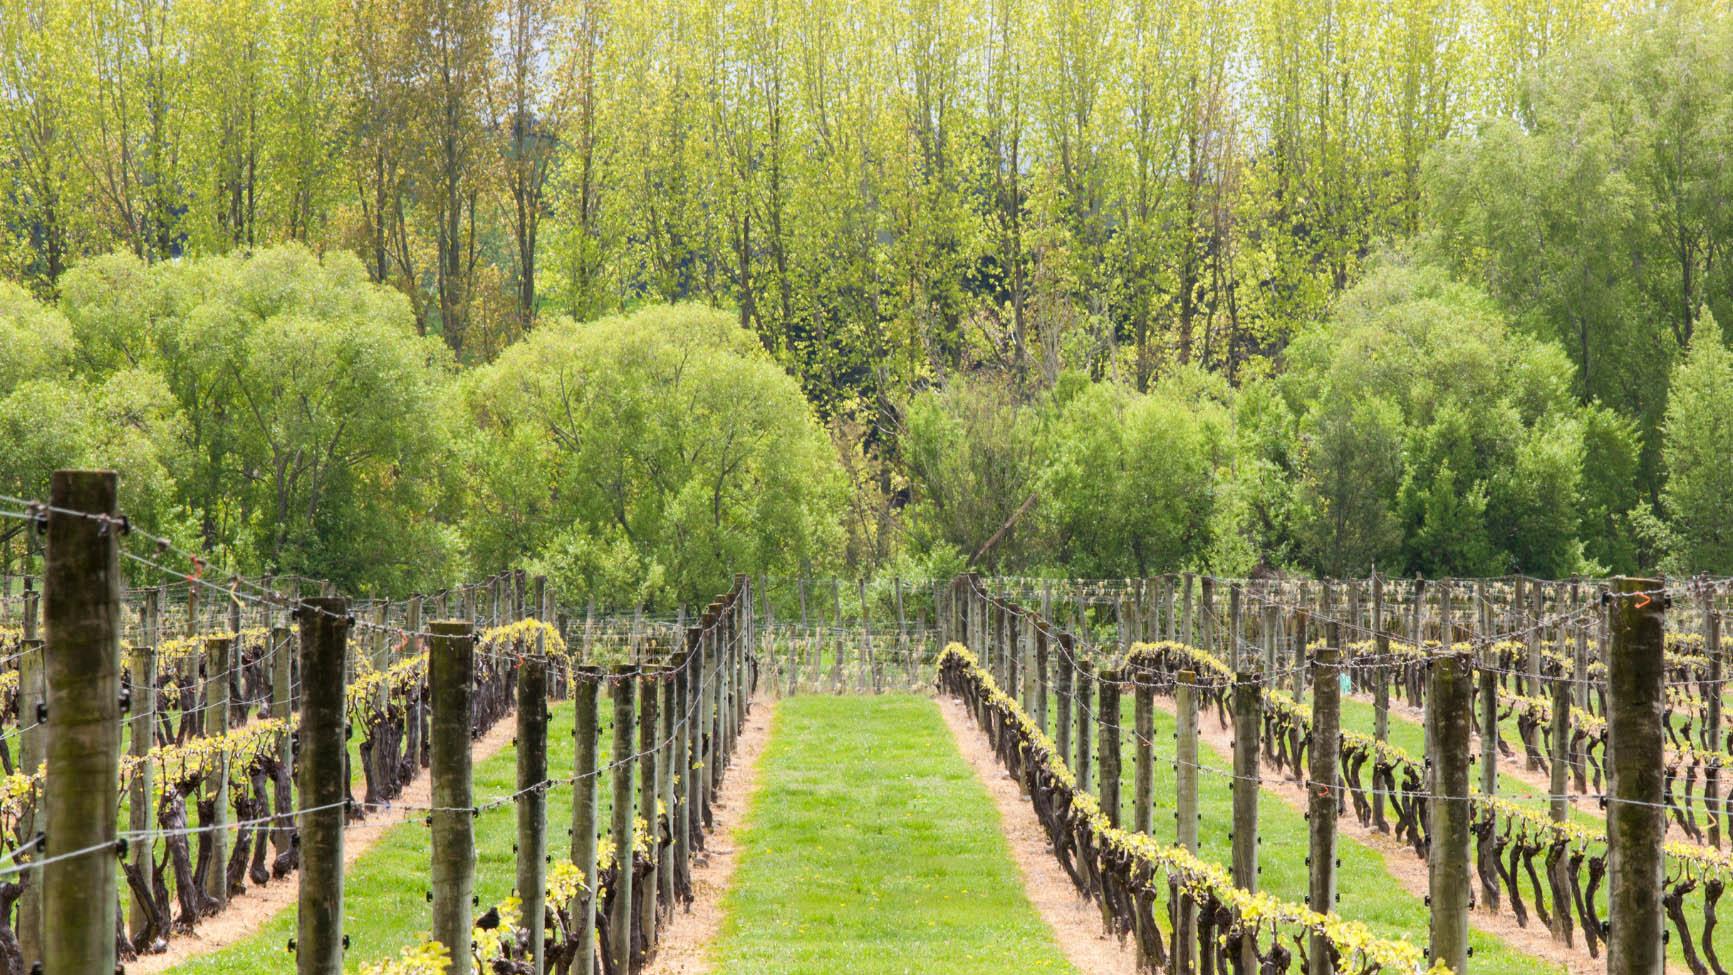 Upper Moutere vineyard, lane view